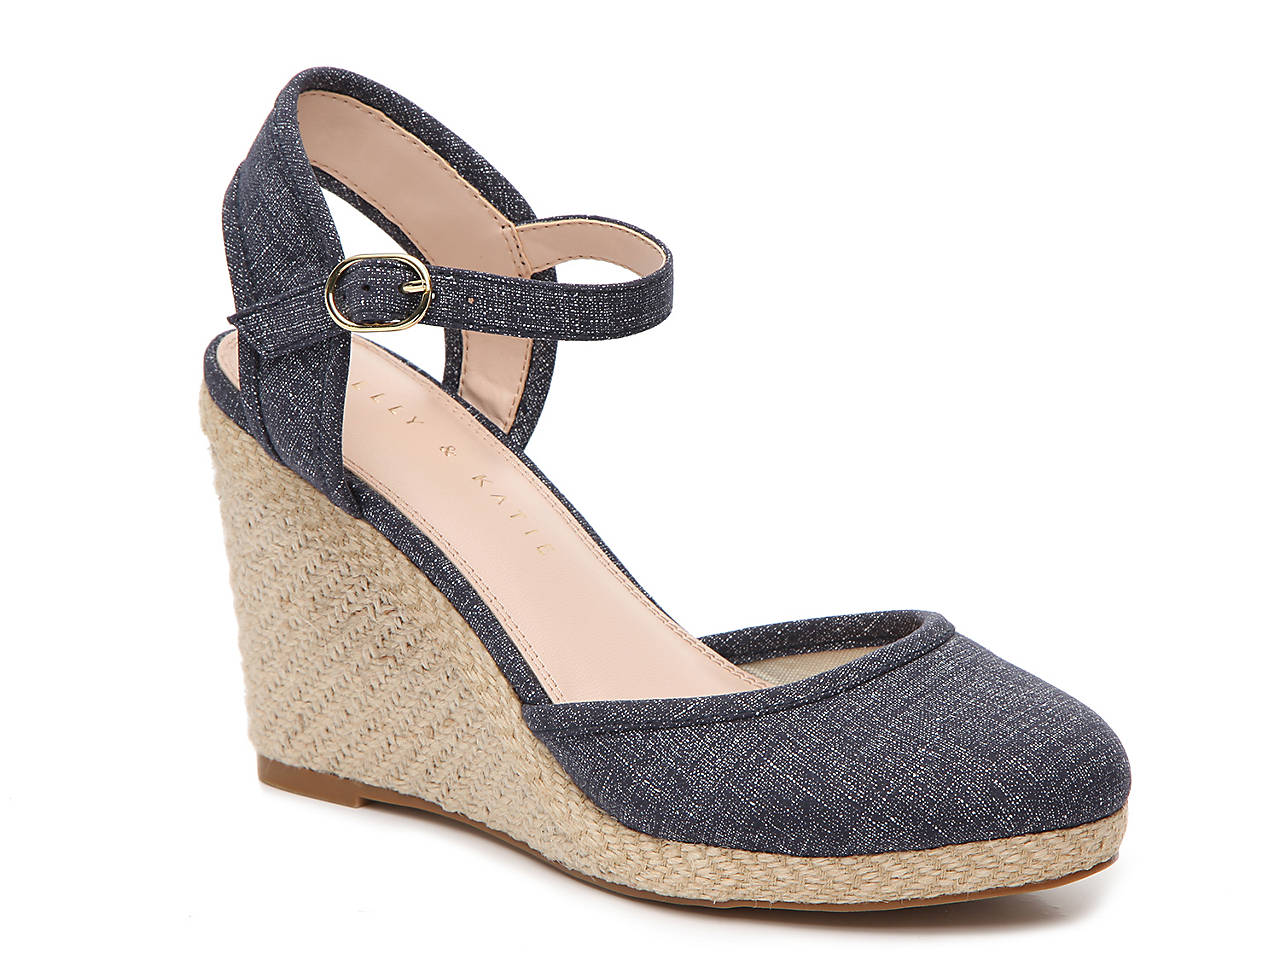 964ee1ebaab Kelly   Katie Miroven Espadrille Wedge Sandal Women s Shoes